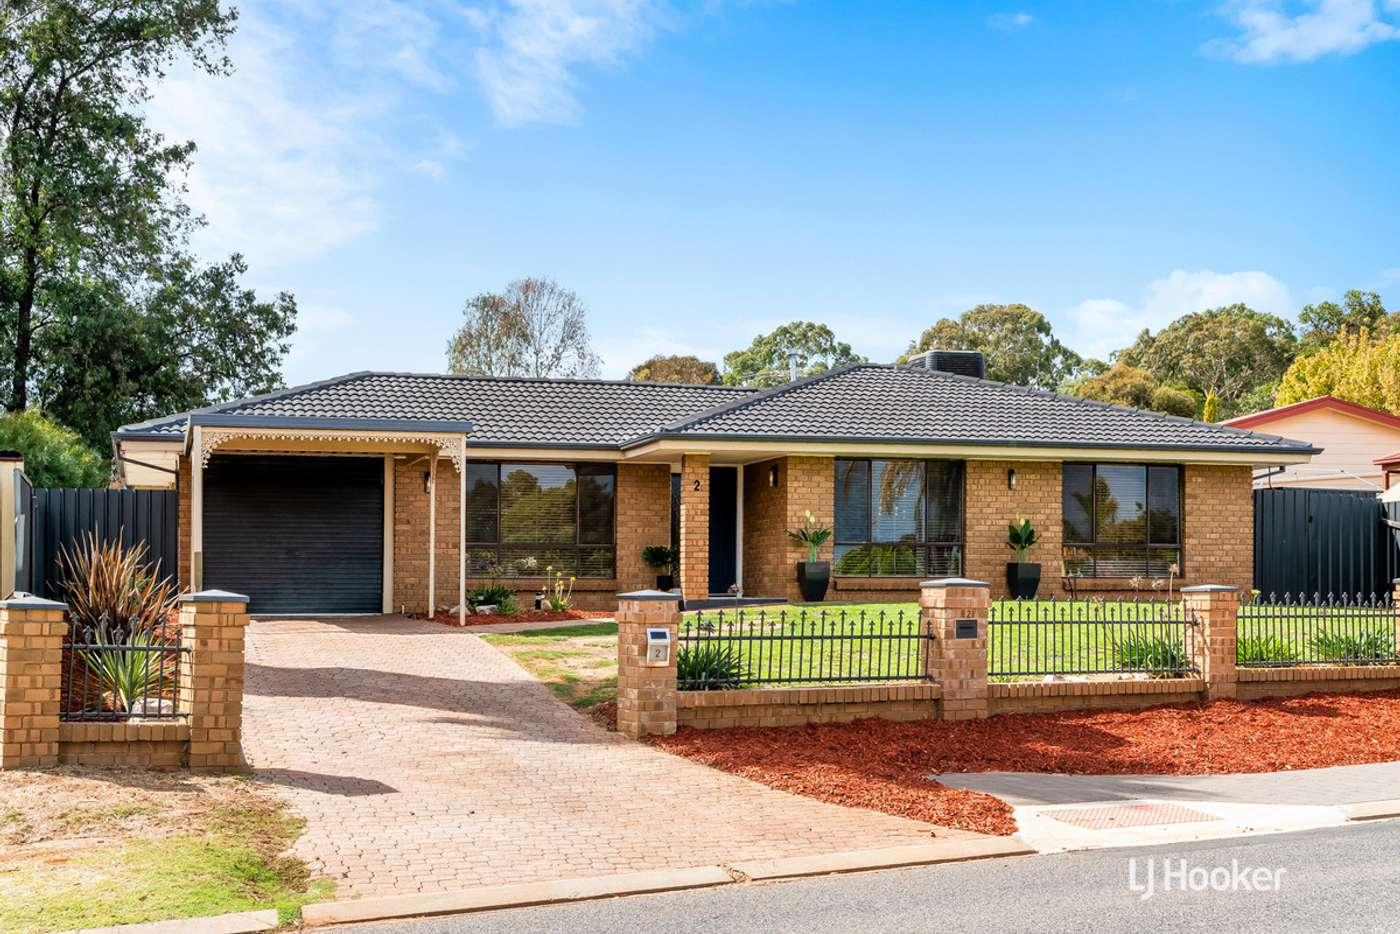 Main view of Homely house listing, 2 Menka Street, Hillbank SA 5112